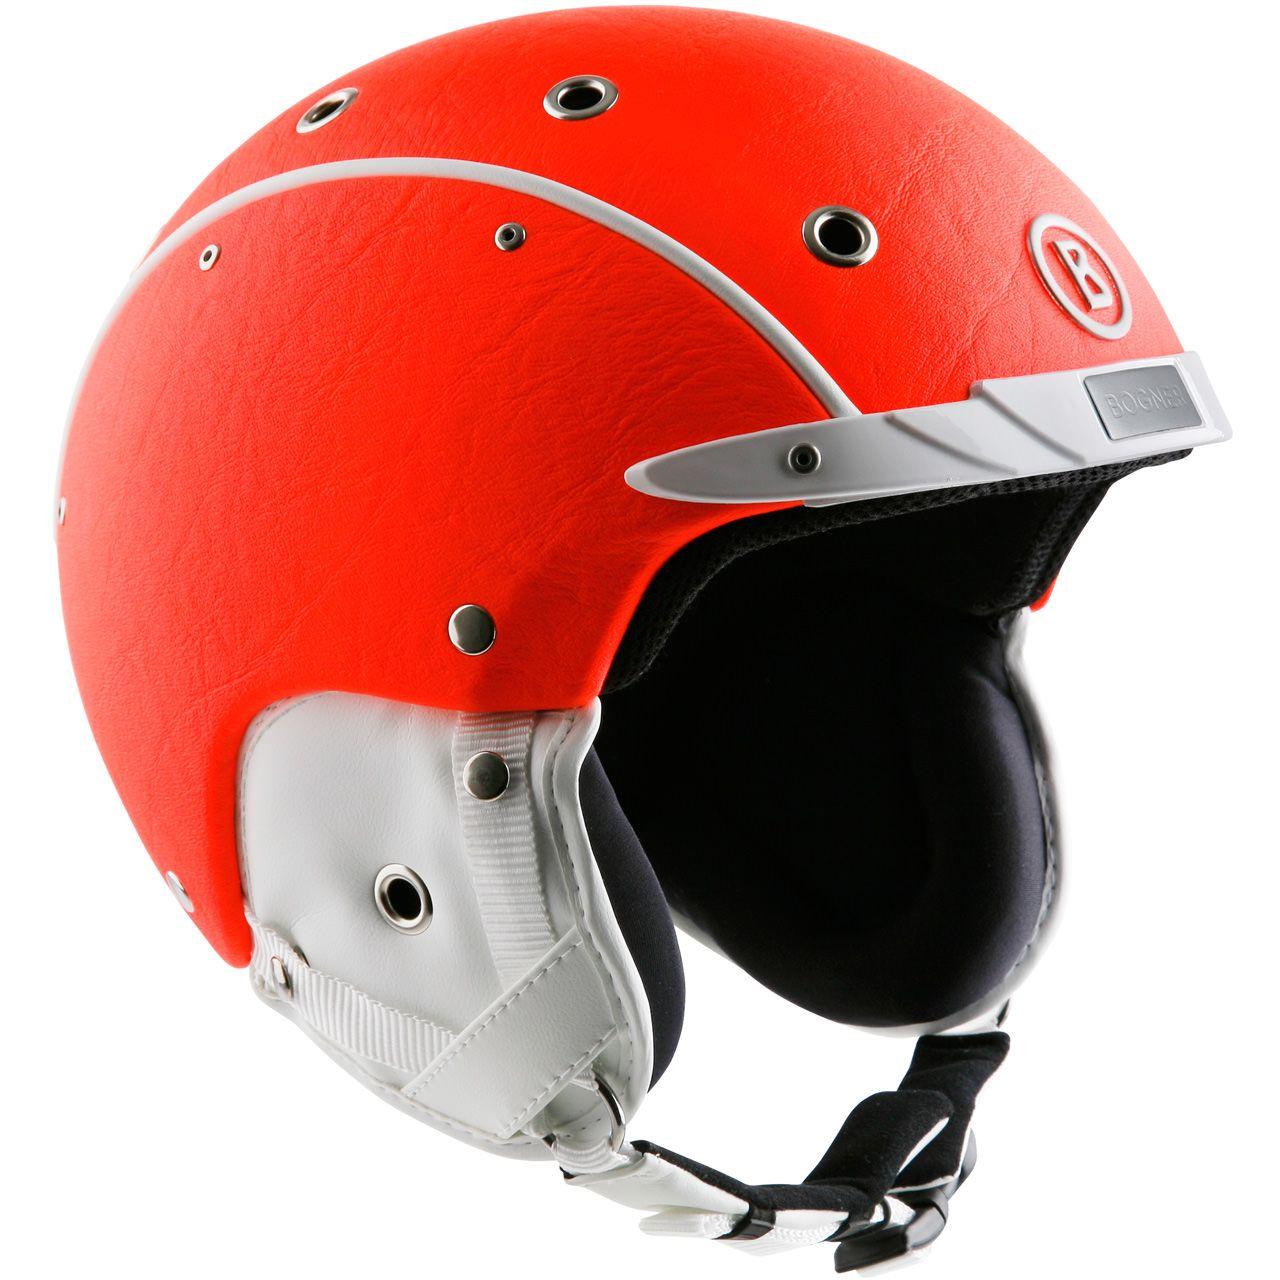 Bogner Helmet Cool watermelon - M = 54 - 58 cm